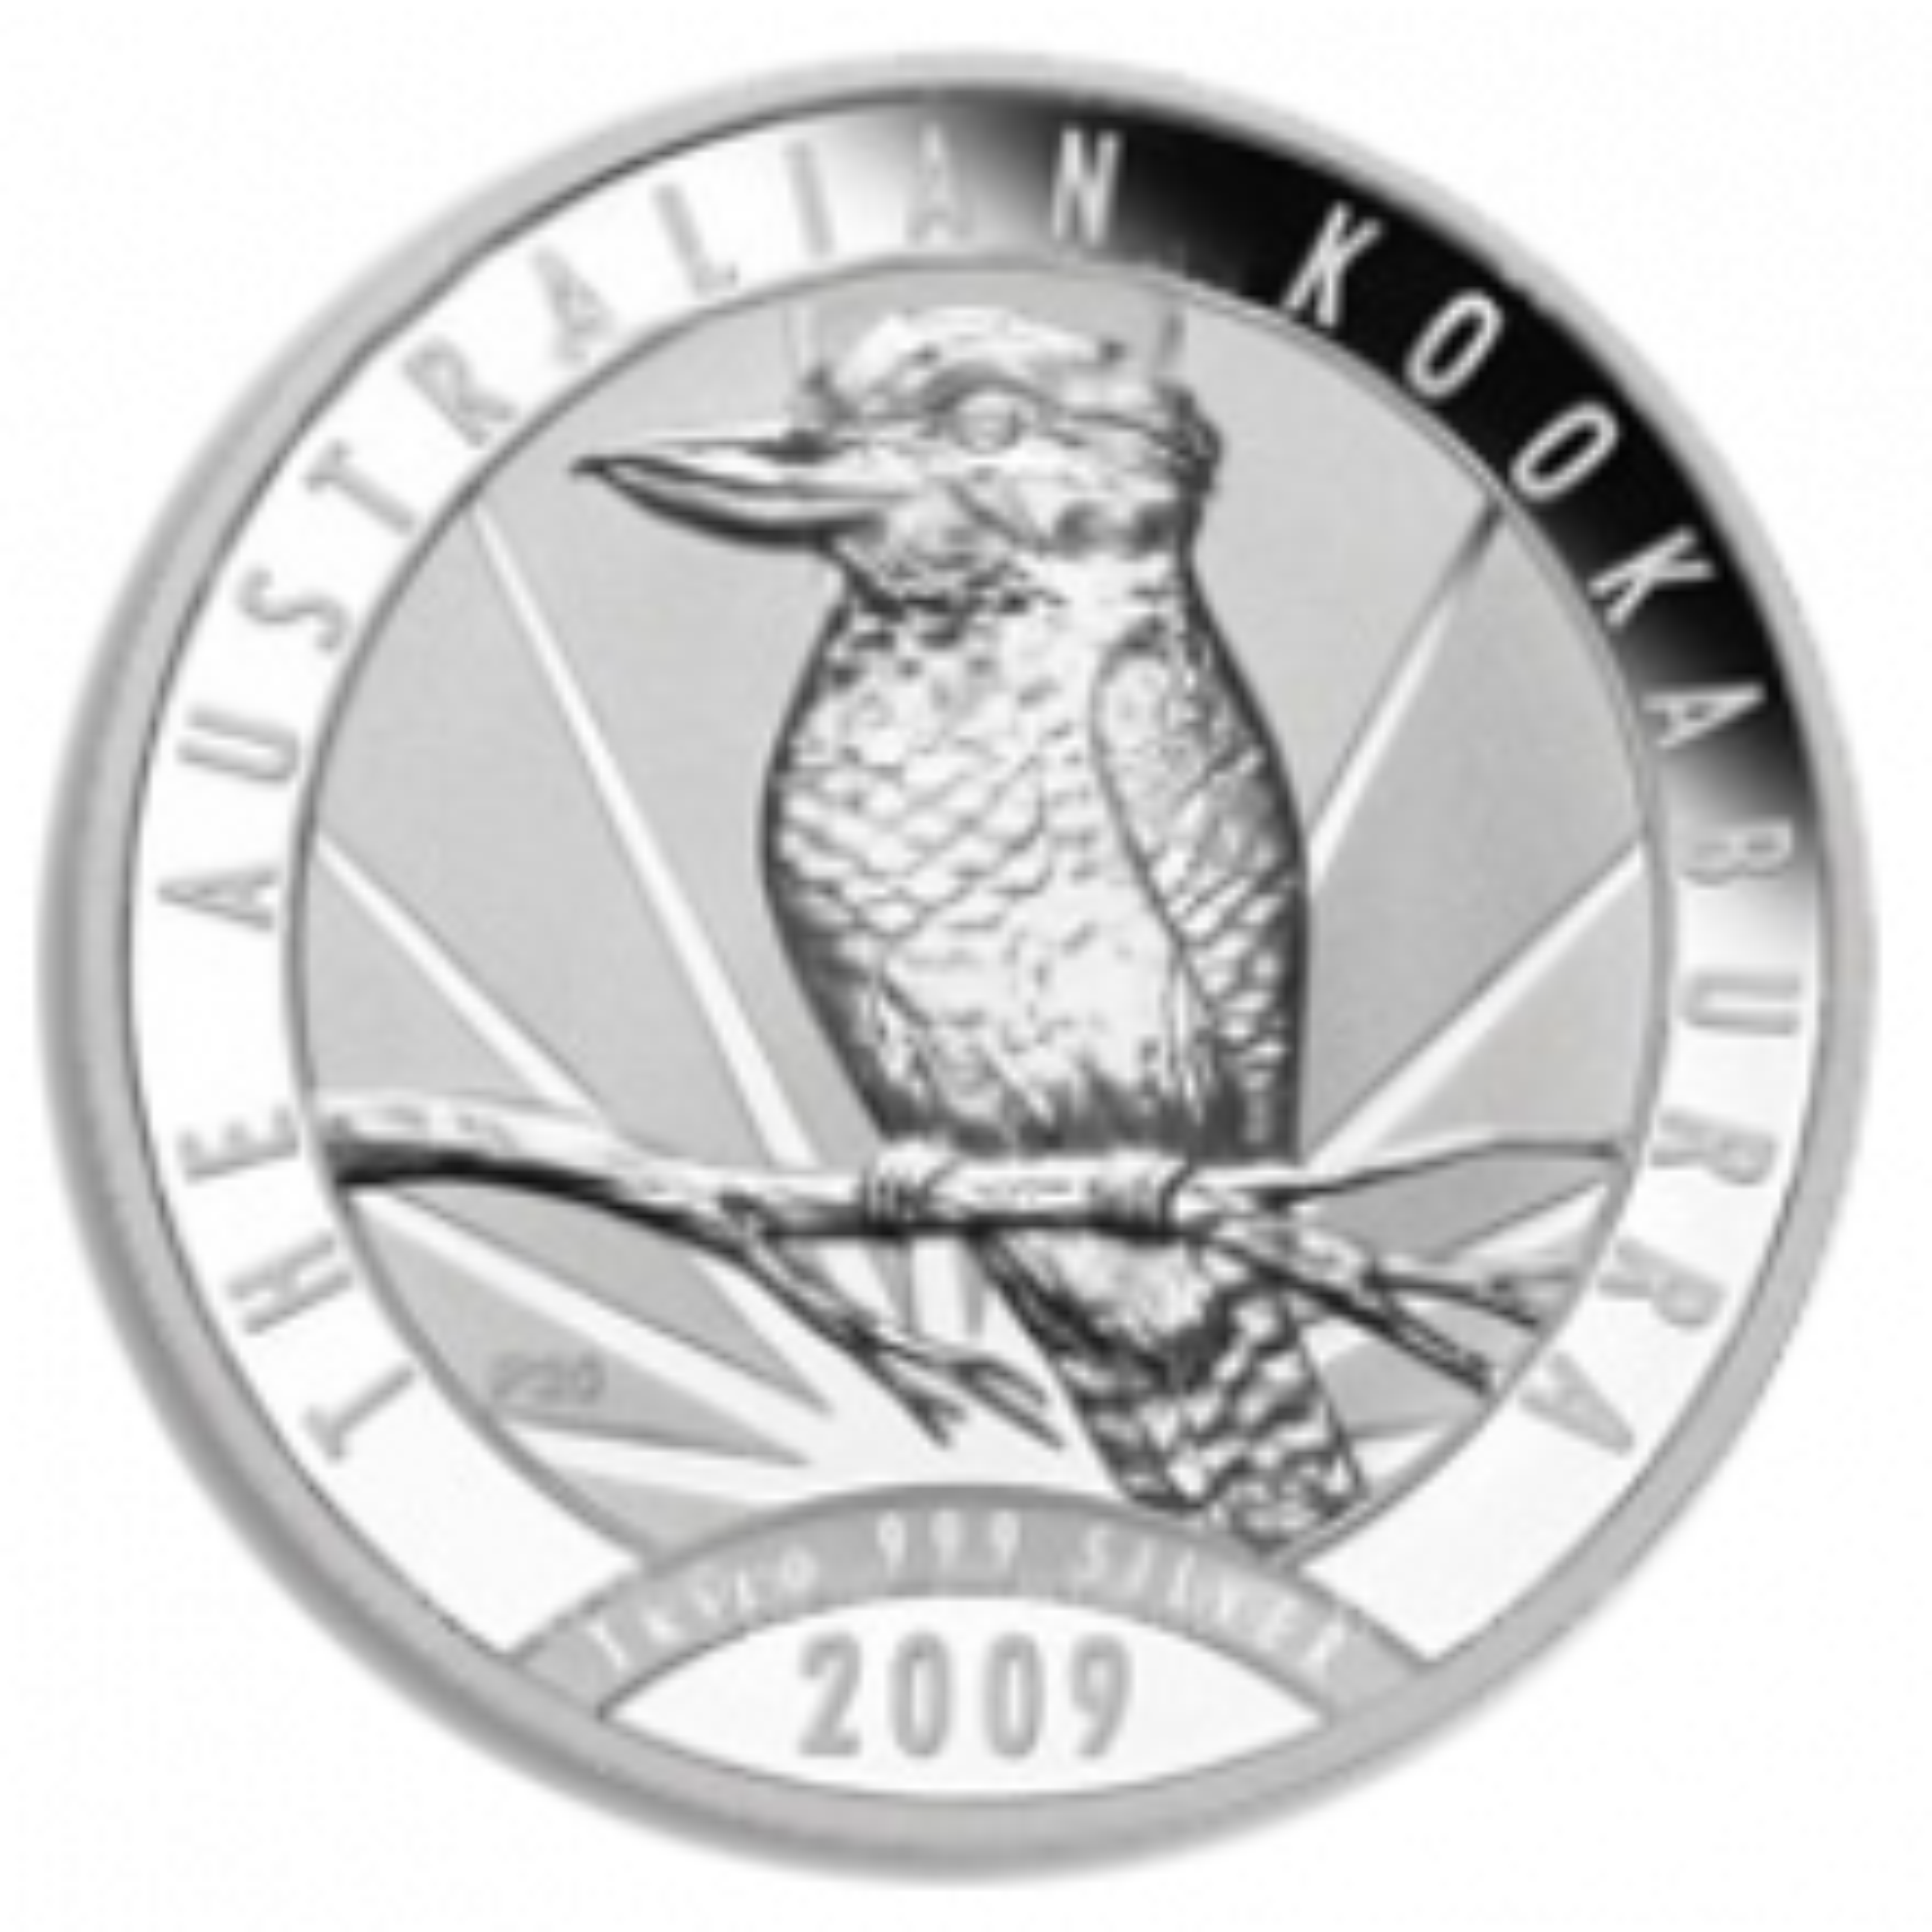 10 troy ounce zilver Kookaburra munt 2009